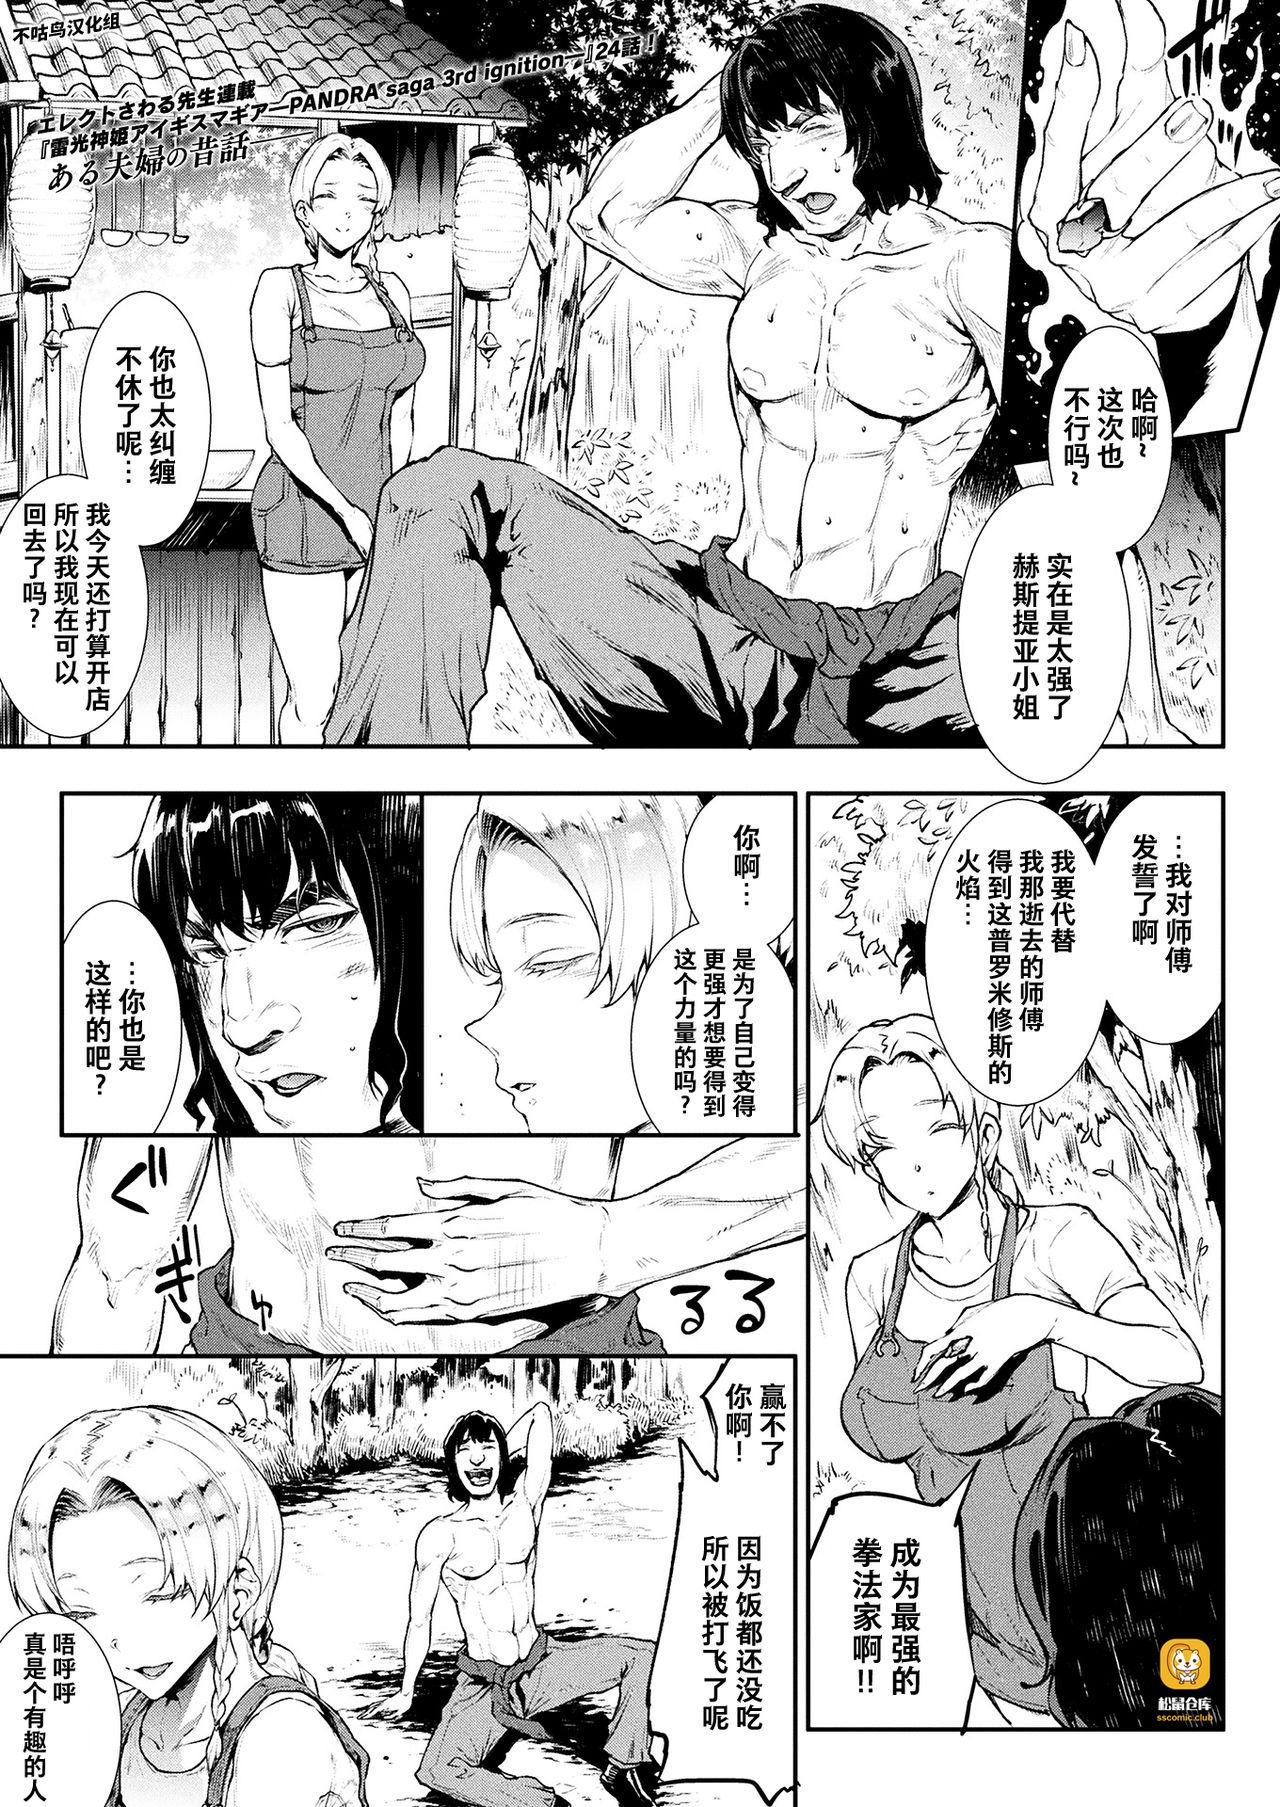 [Erect Sawaru] Raikou Shinki Igis Magia -PANDRA saga 3rd ignition- Ch. 24 (COMIC Unreal 2020-08 Vol. 86) [Chinese] [不咕鸟汉化组] [Digital] 0